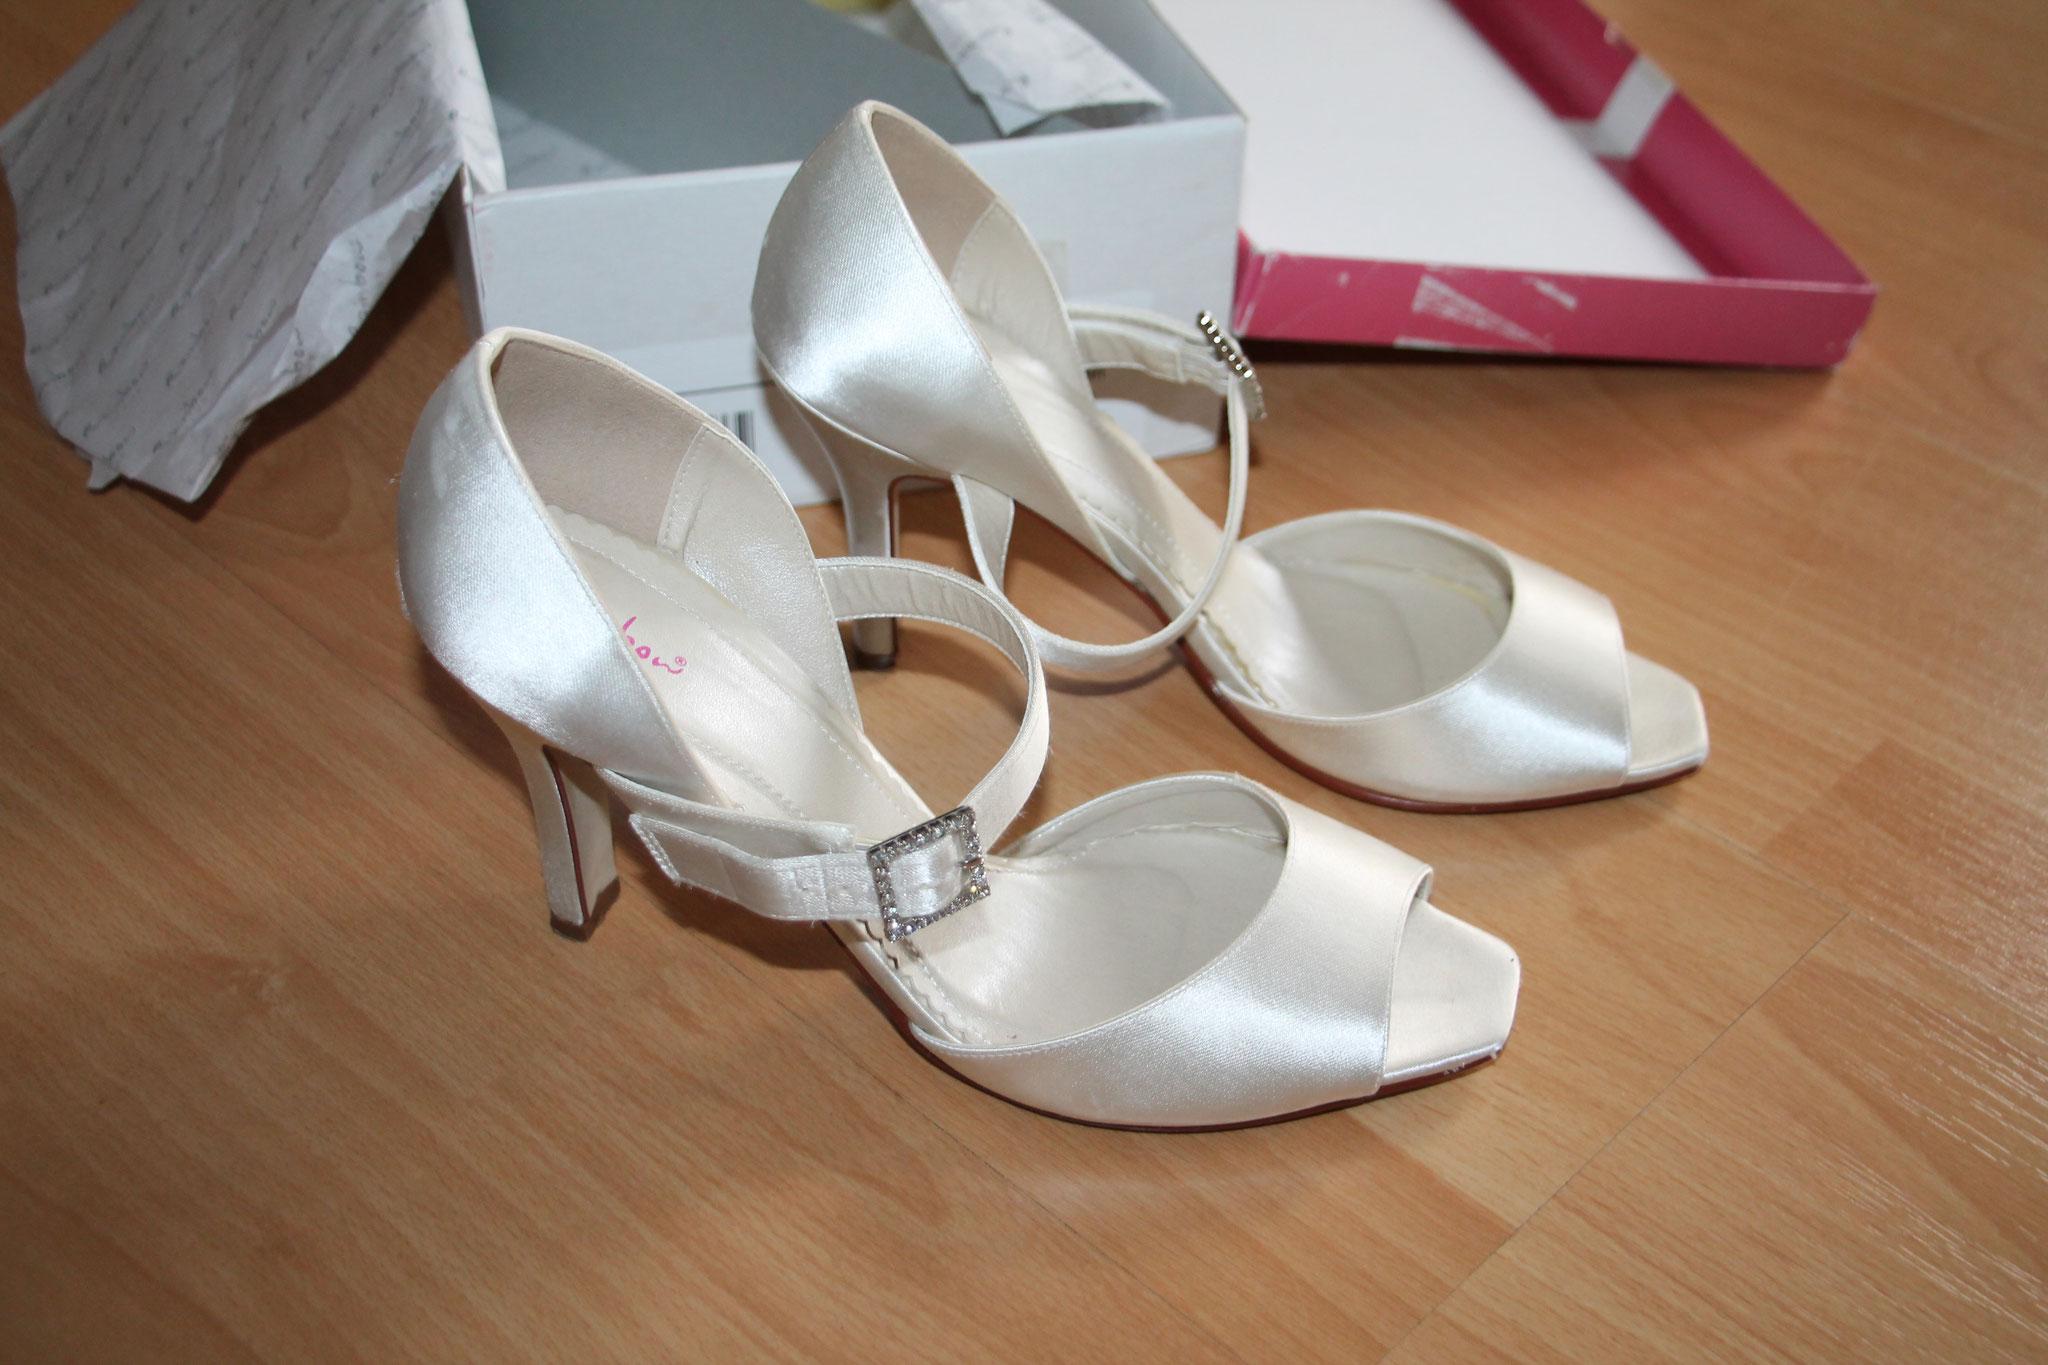 buy popular 5315e b74eb Schuhe sind Rudeltiere :-) - mari-mes Webseite!